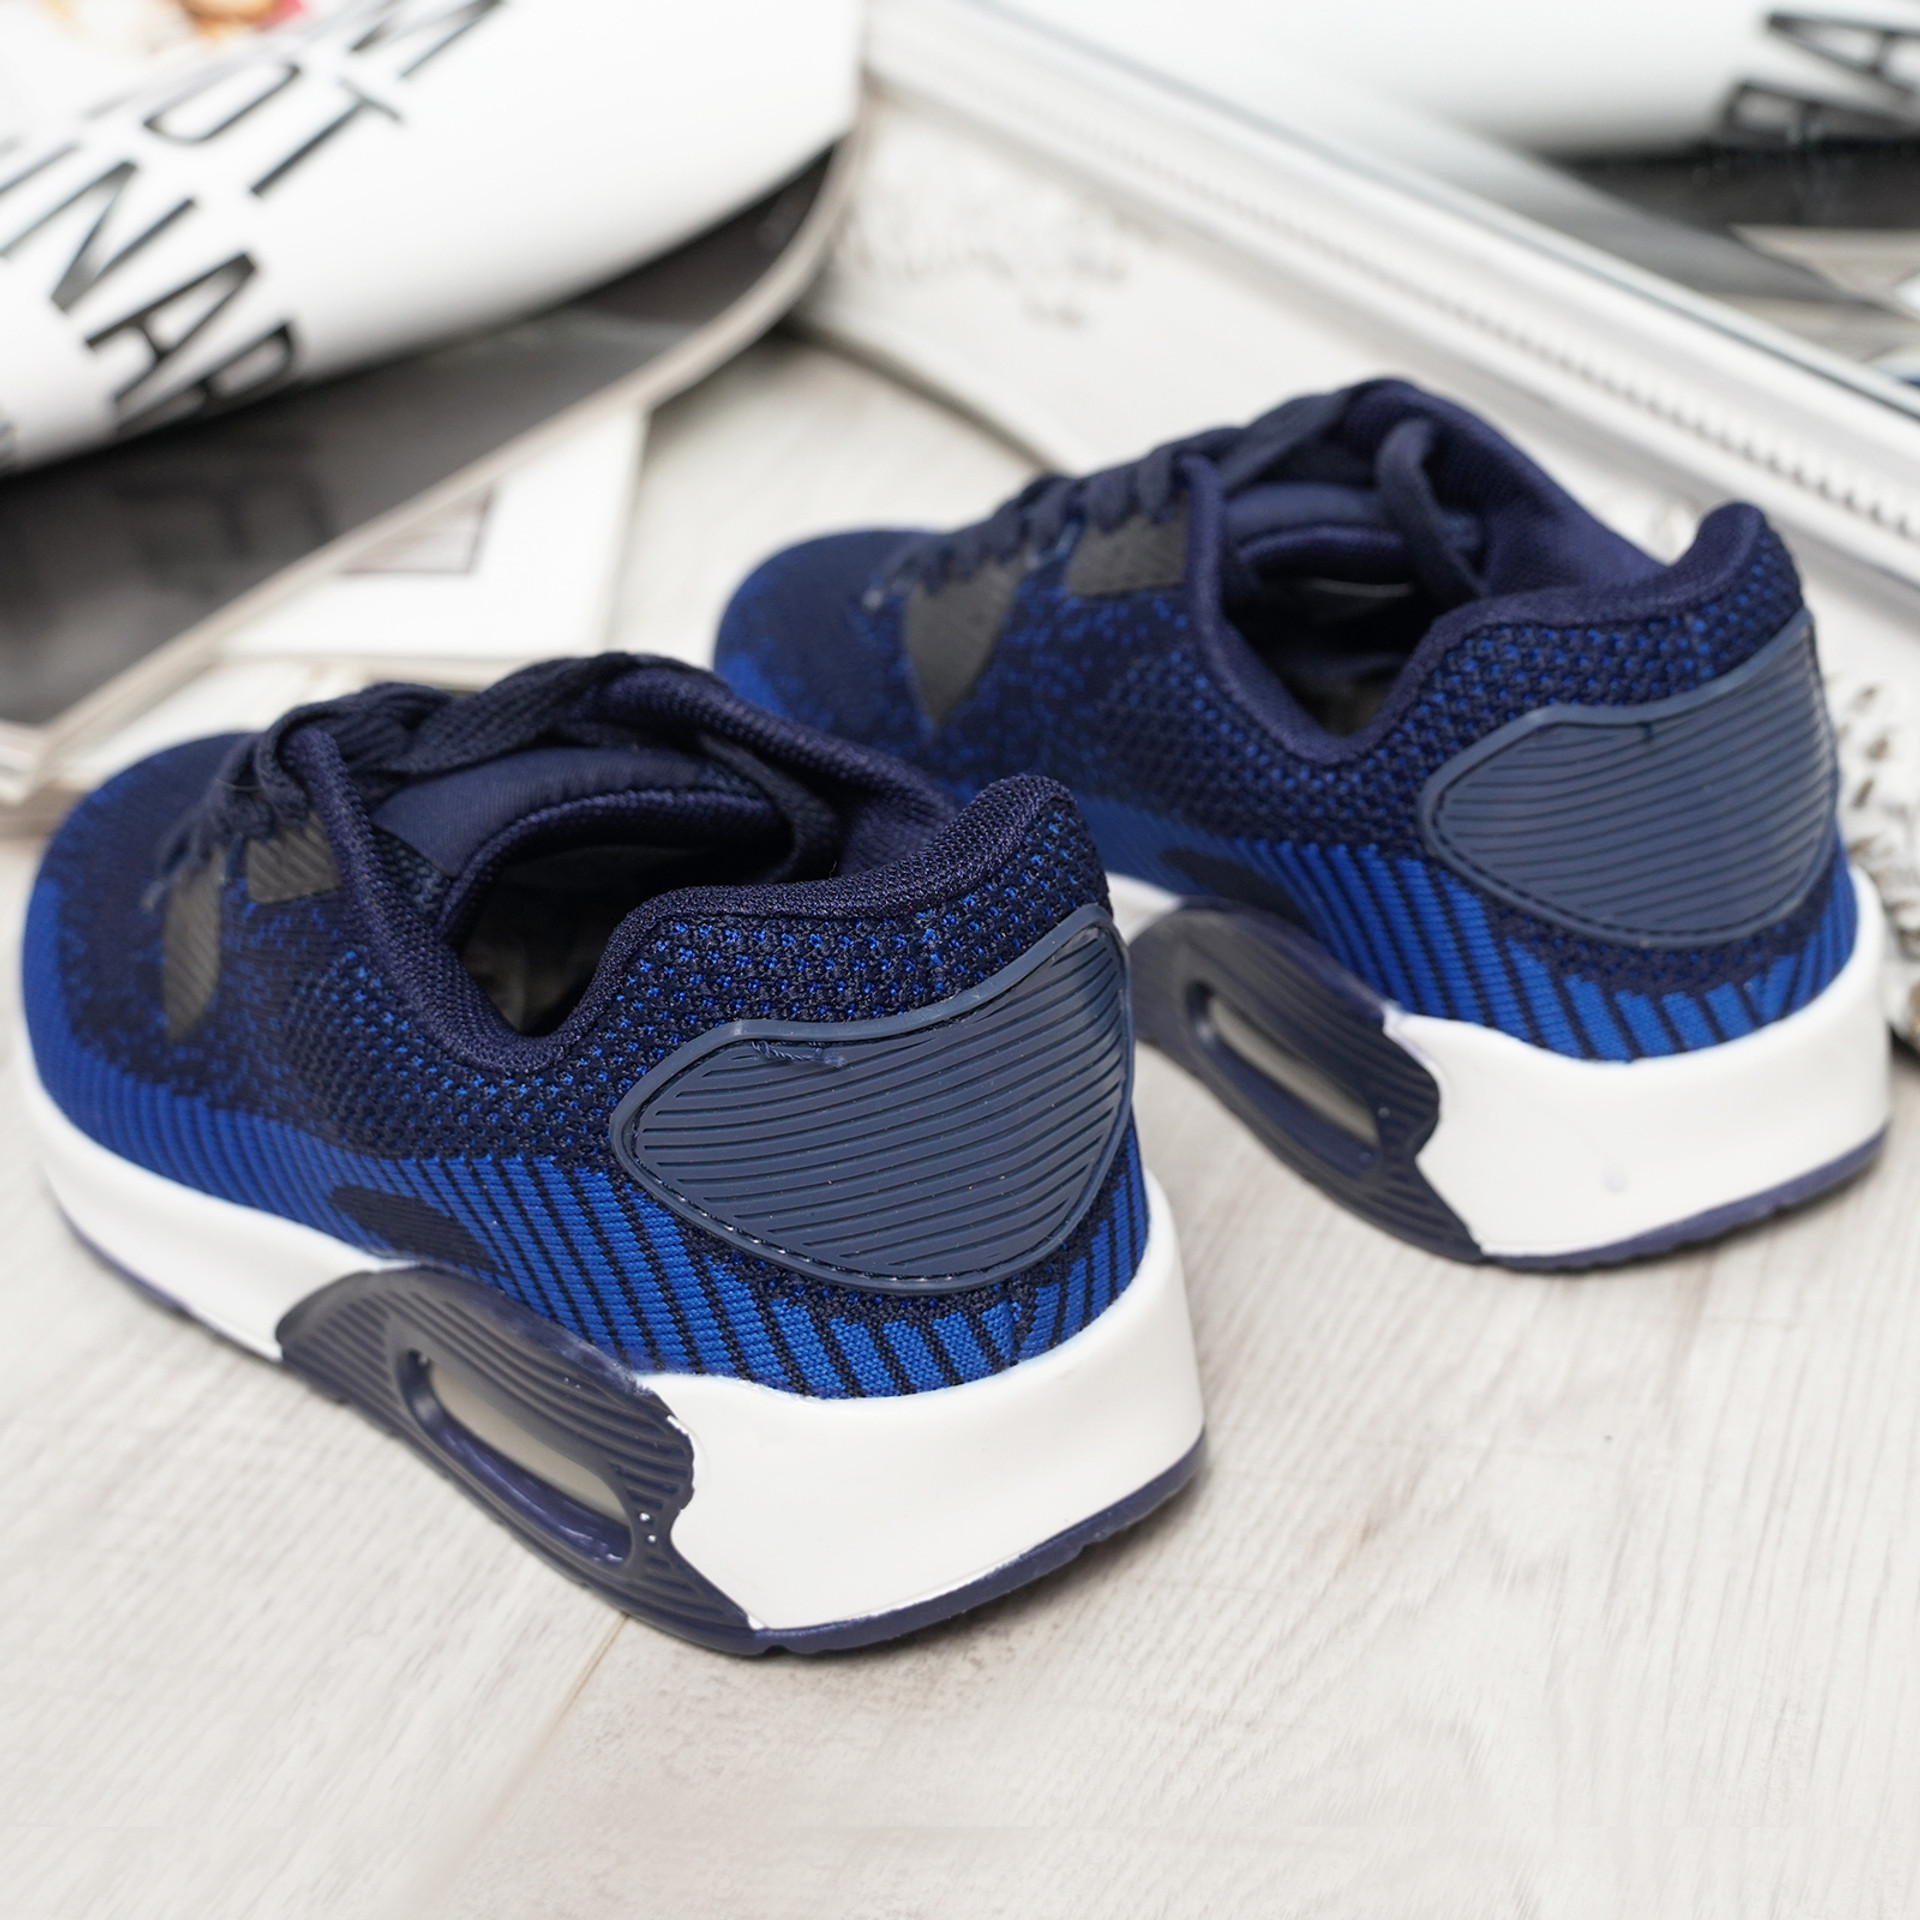 Larry Navy Sport Kids Trainers Sneakers